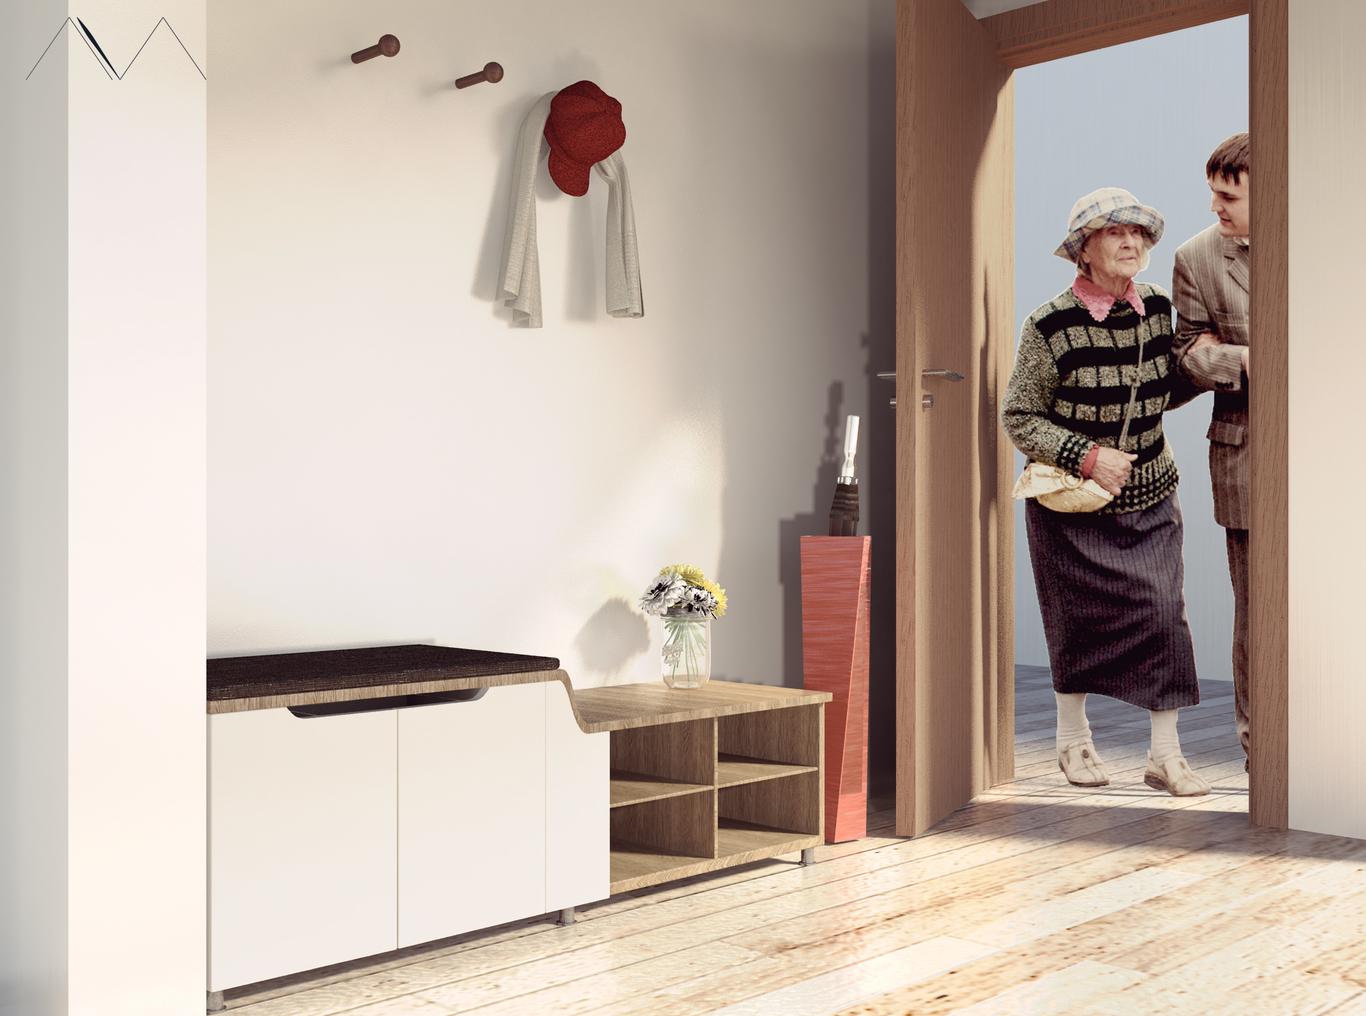 Angelamaria99 furniture design for 1 e8786e80 22qi